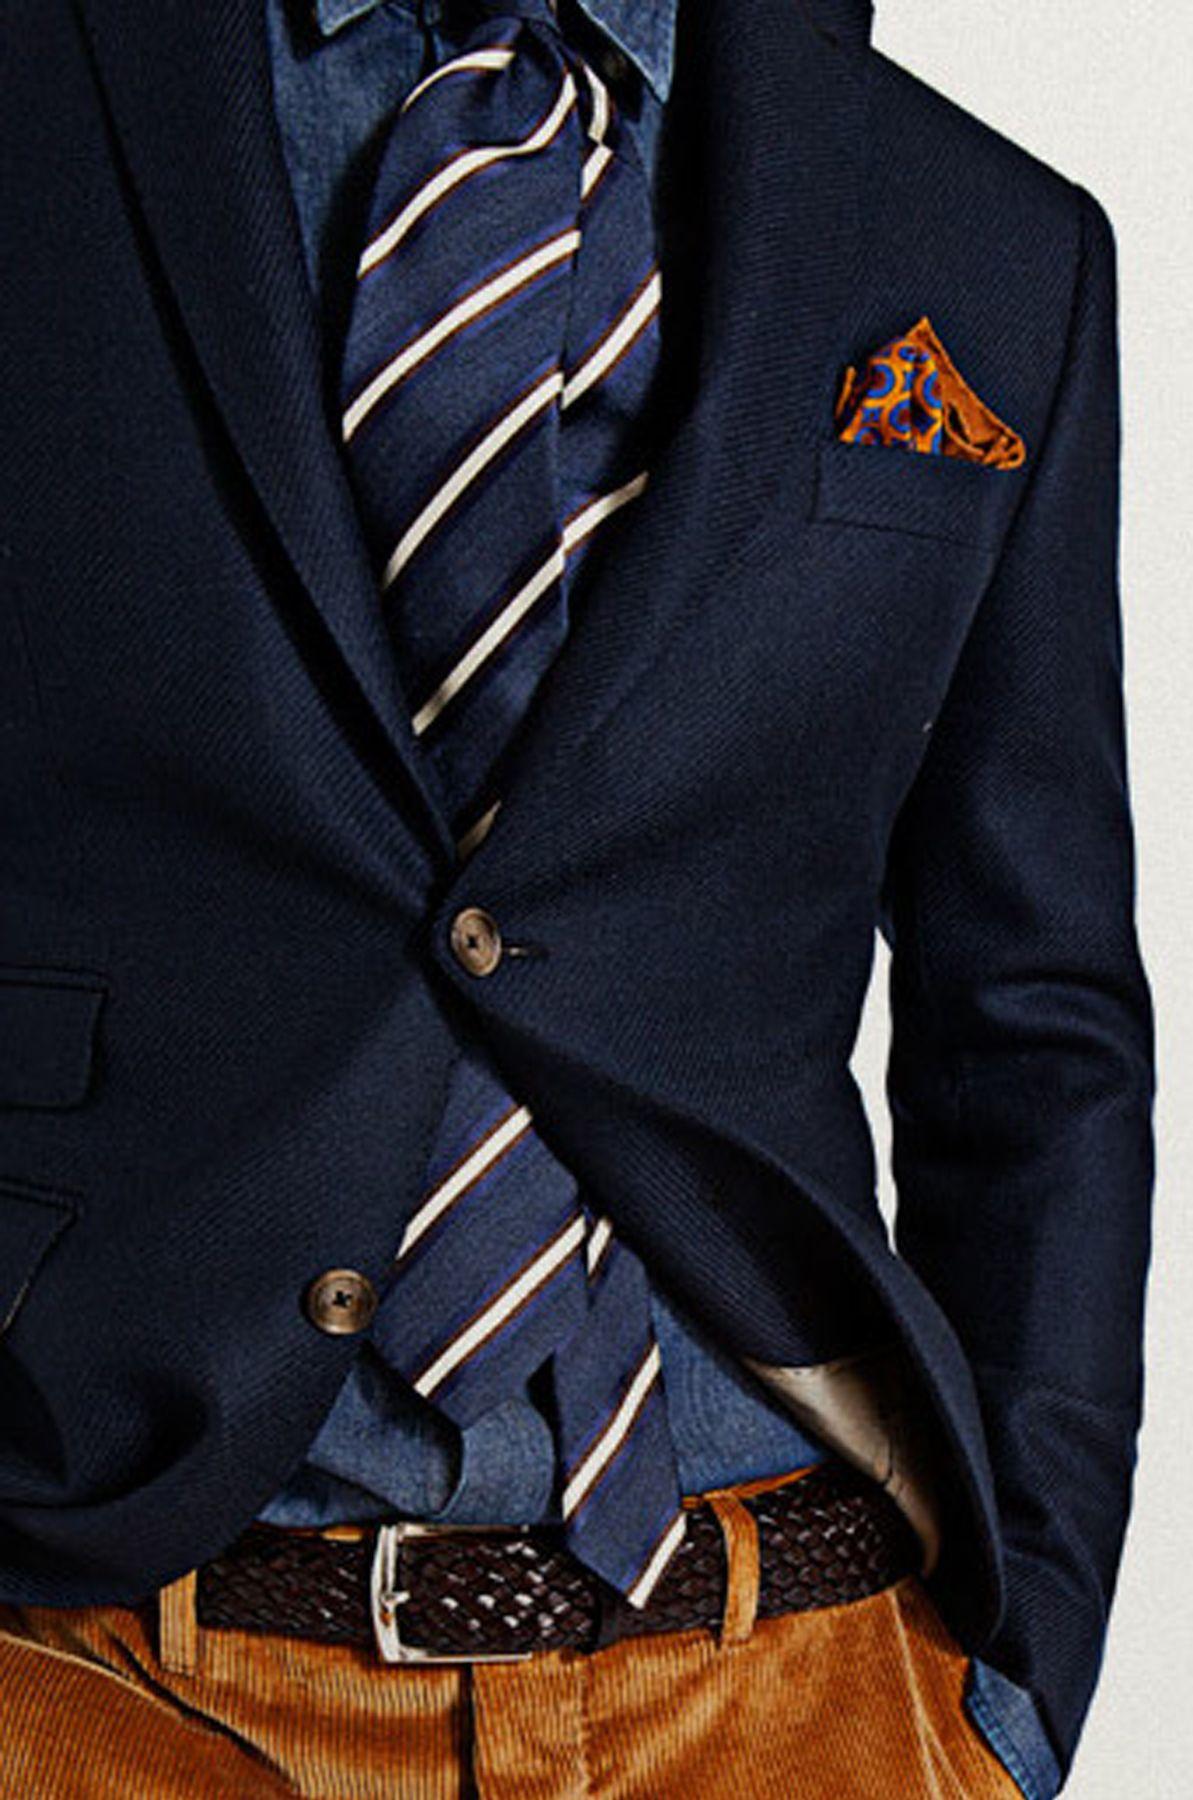 4a2d66a6c4 27 Unspoken Suit Rules Every Man Should Know